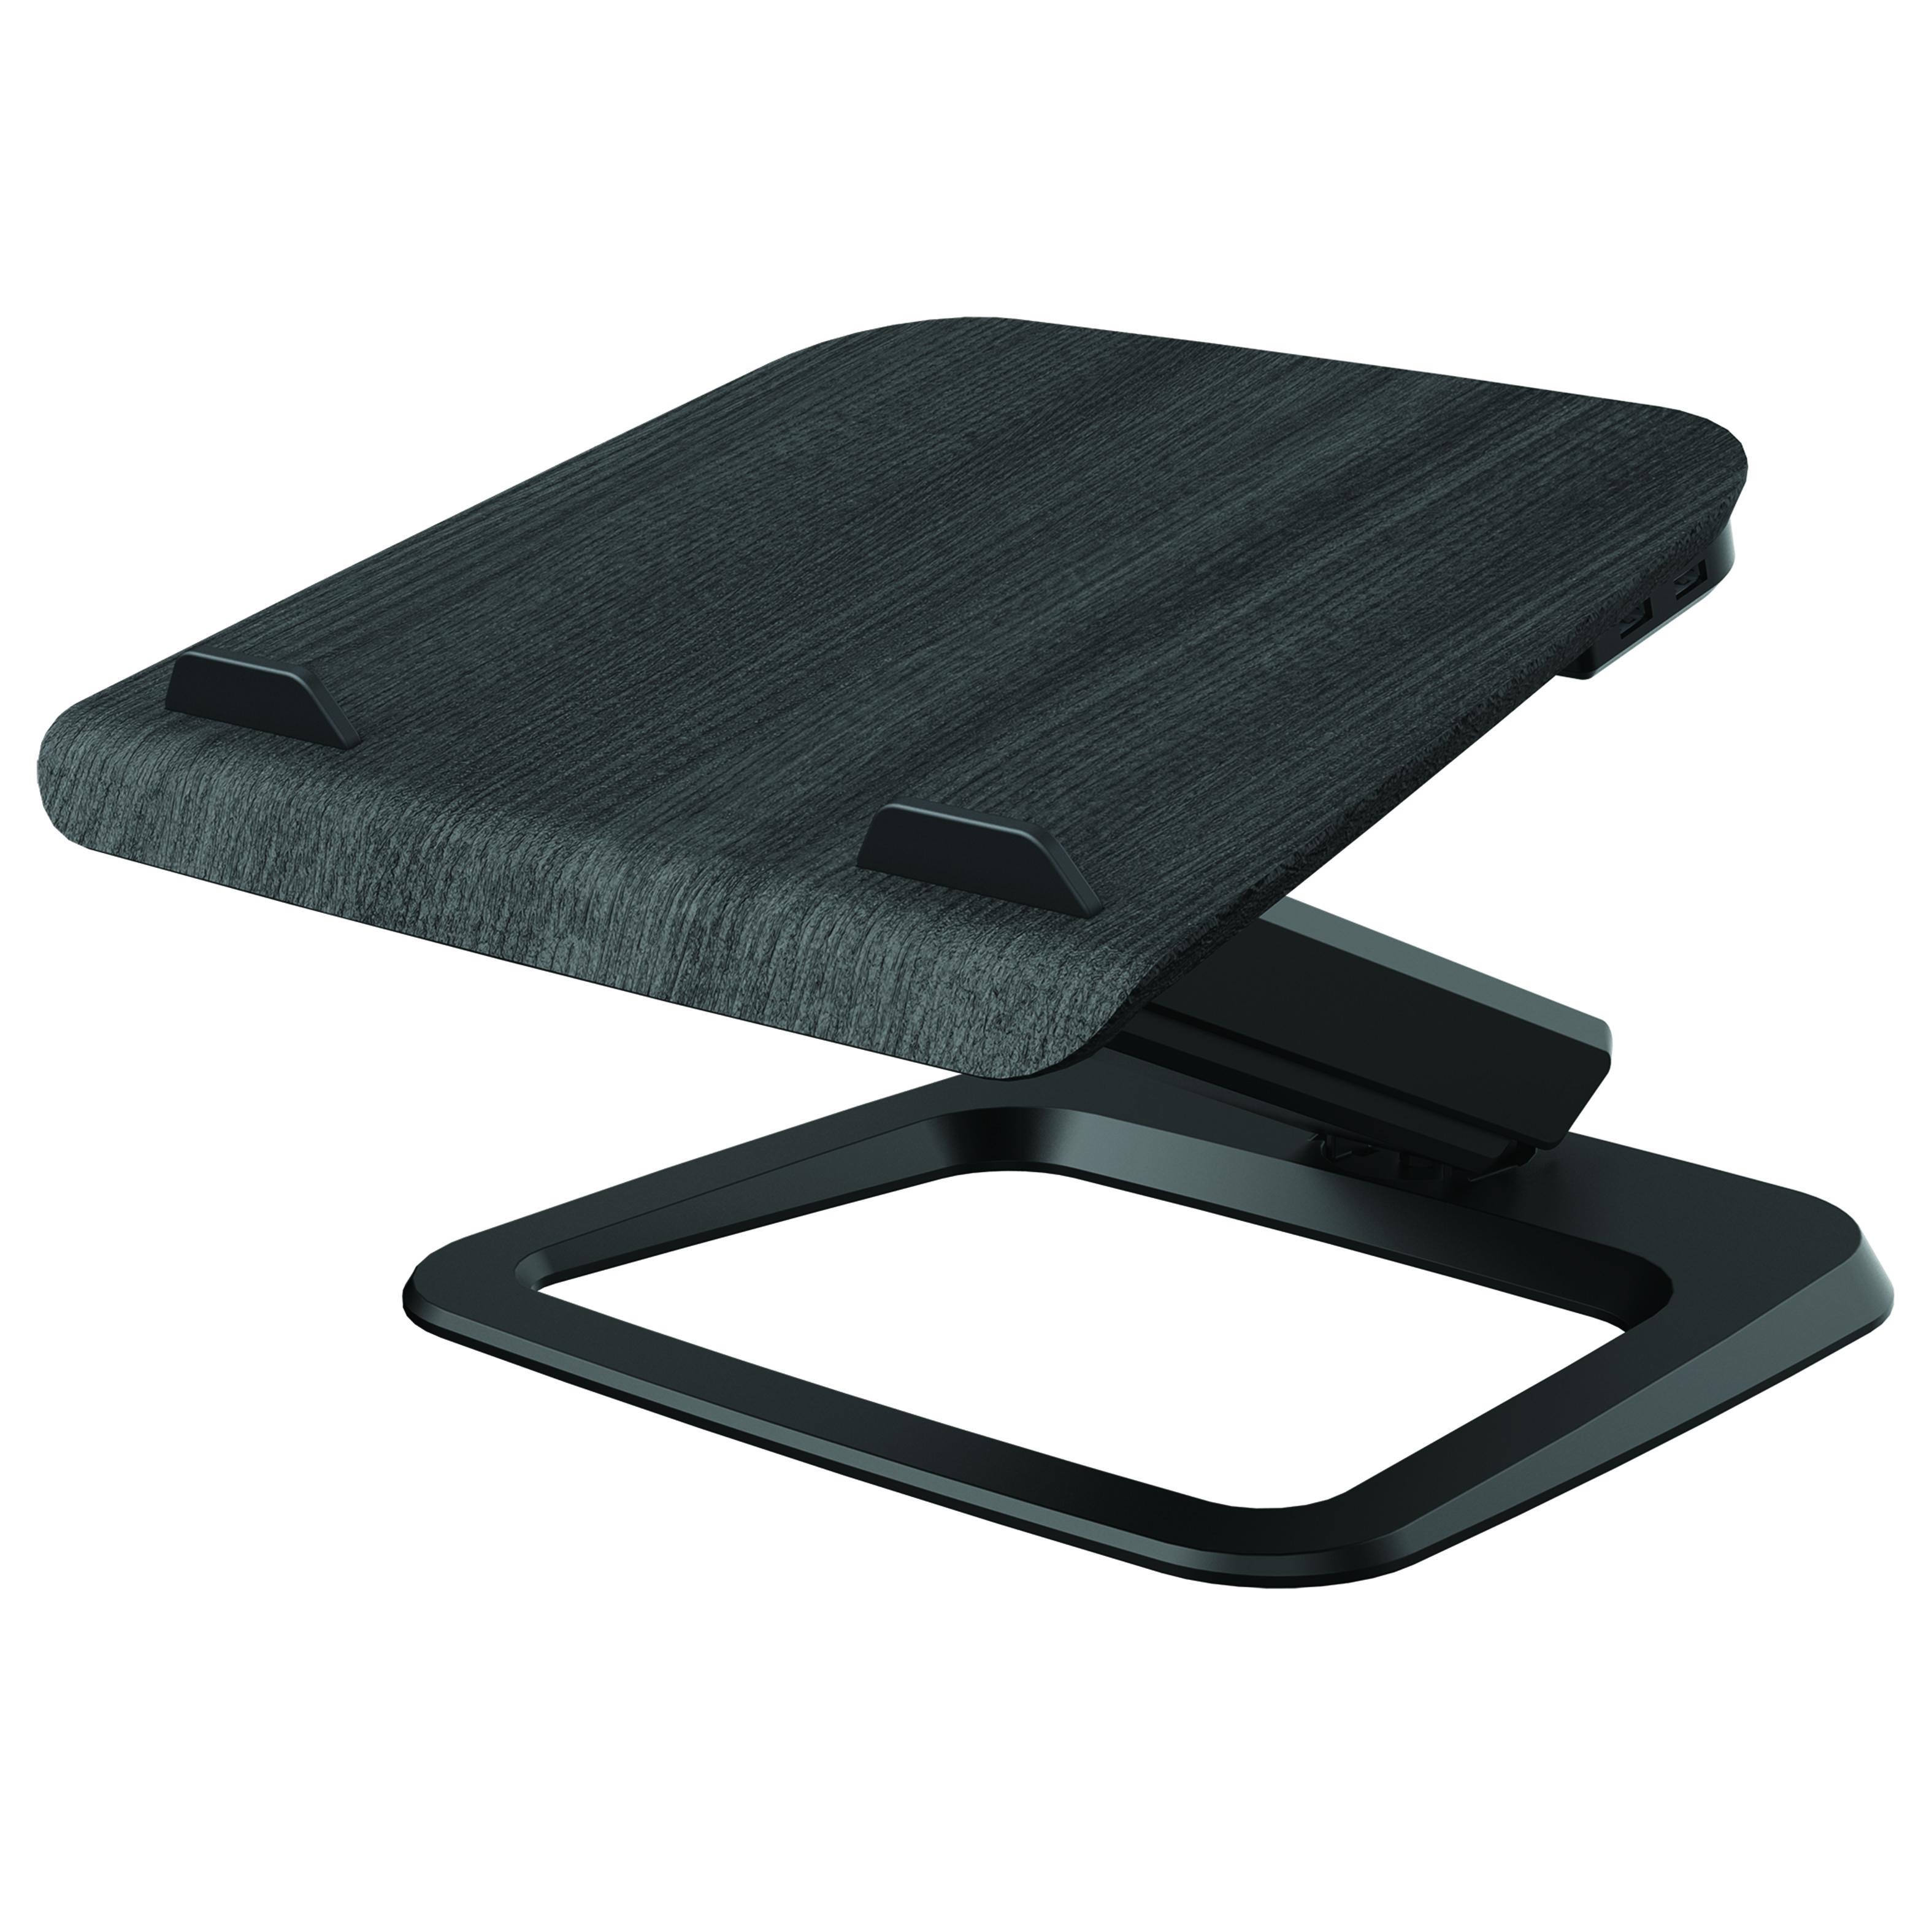 esi hana laptop support in black